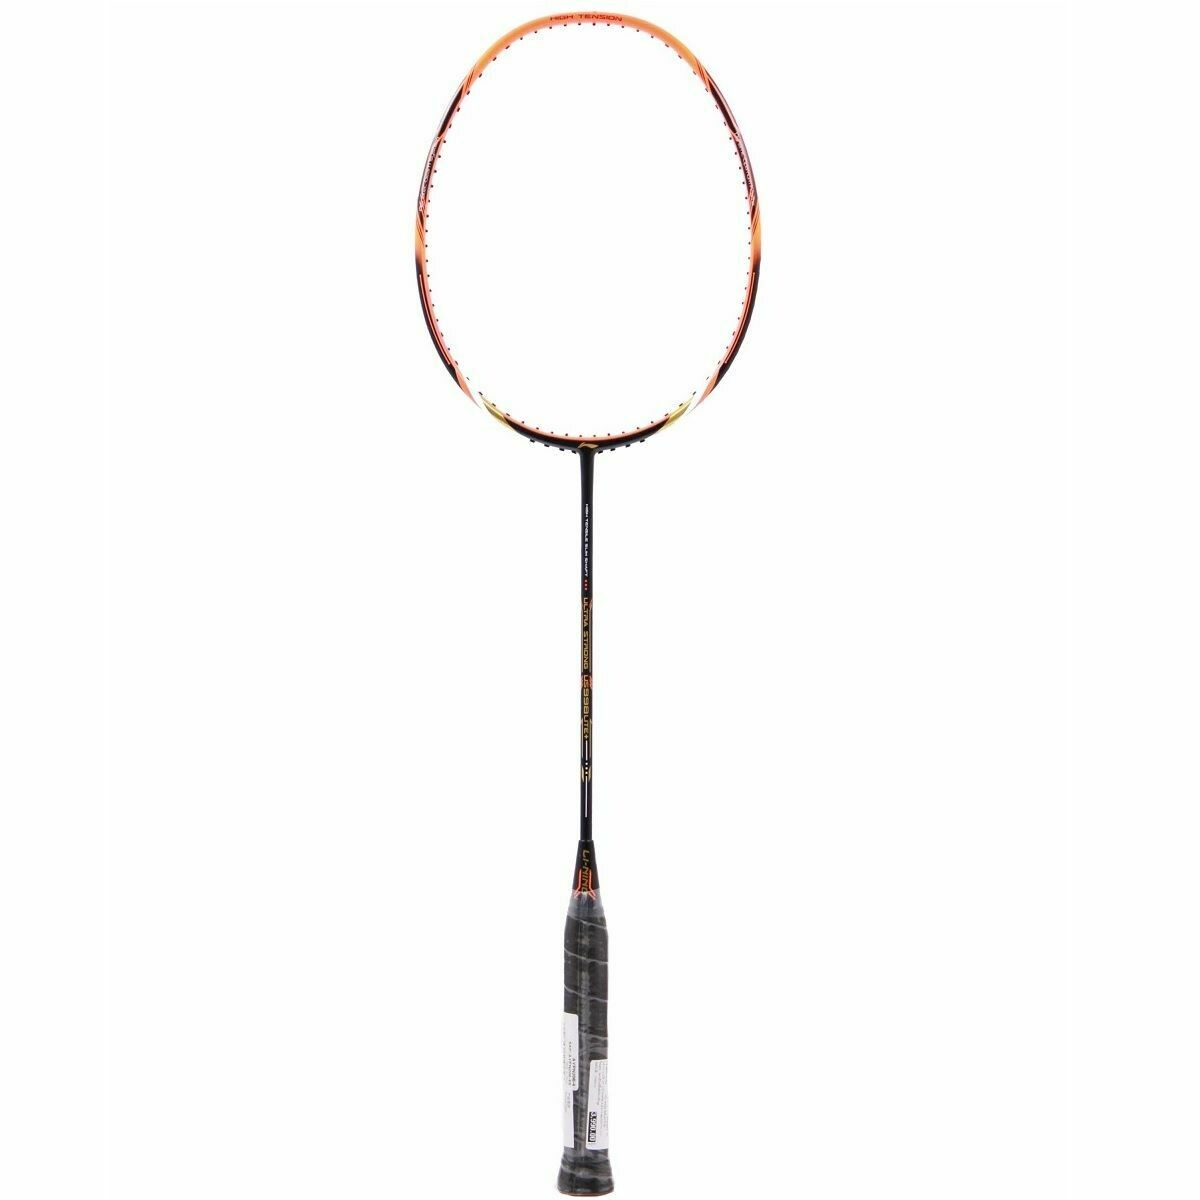 LI-NING Ultra Strong US 998 Lite + Badminton Racquet -